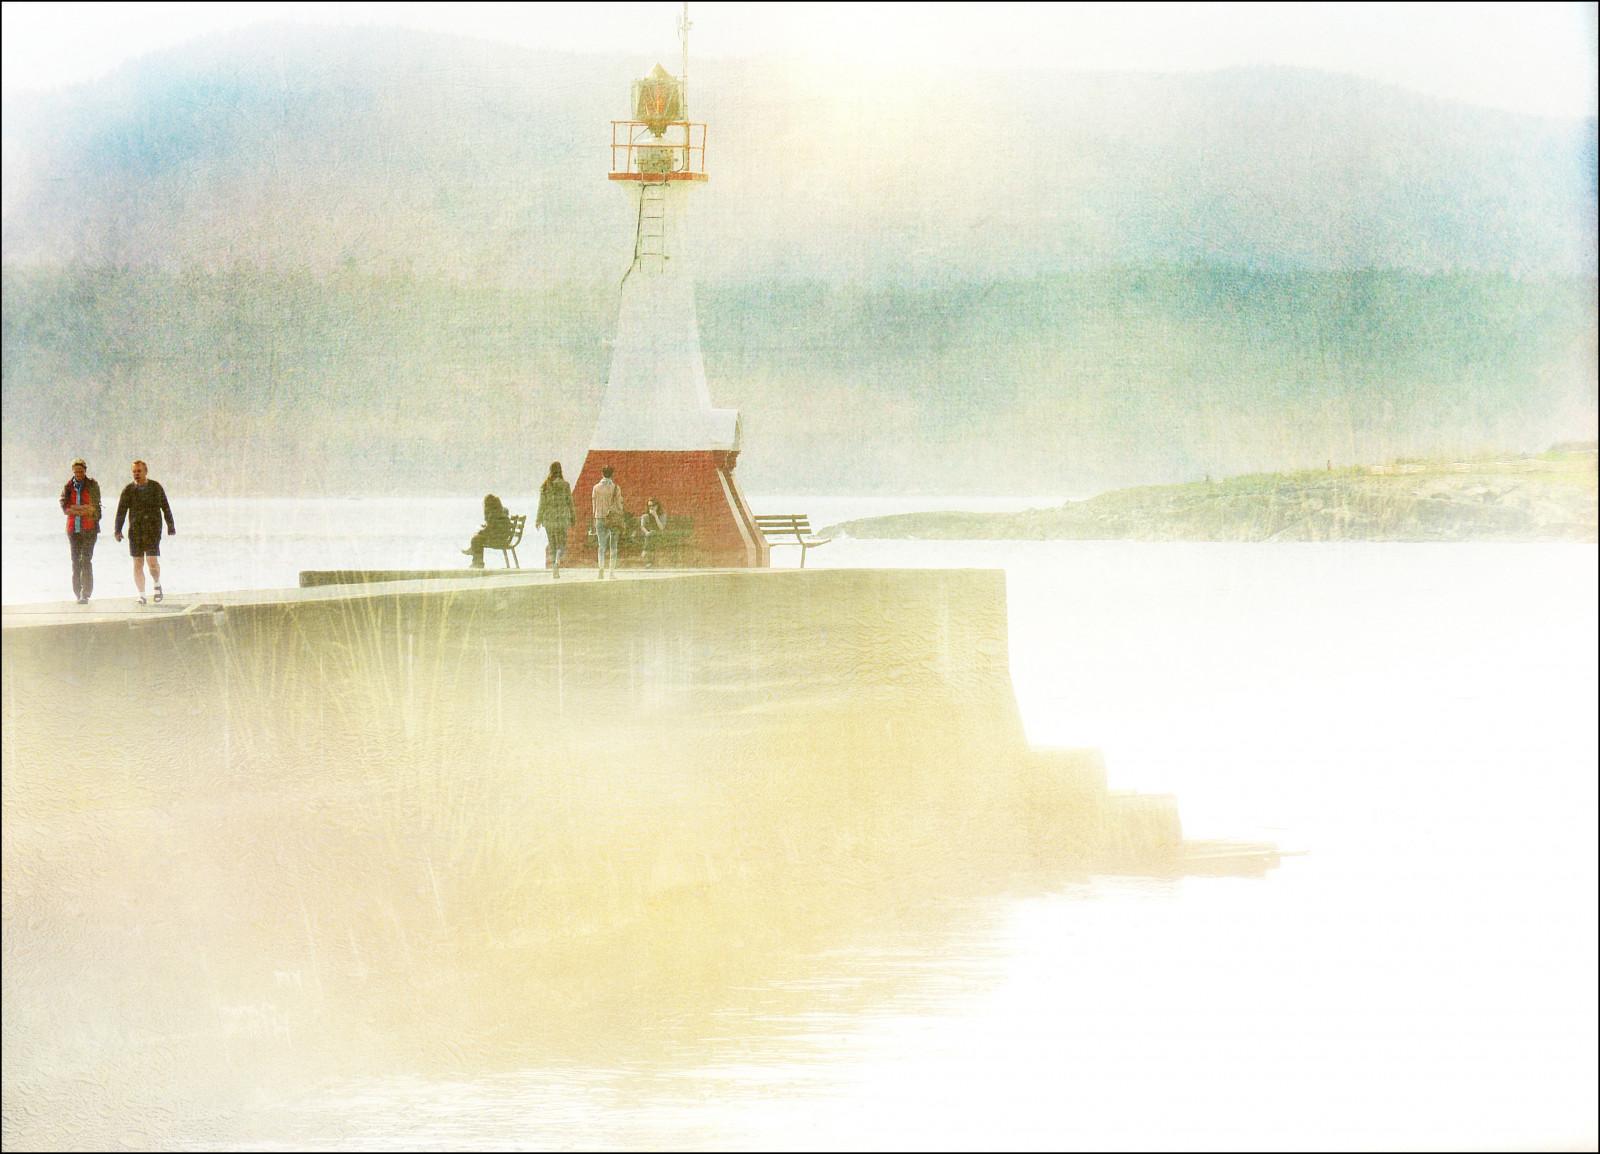 Masaustu Manzara Boyama Deniz Su Gokyuzu Sakin Deniz